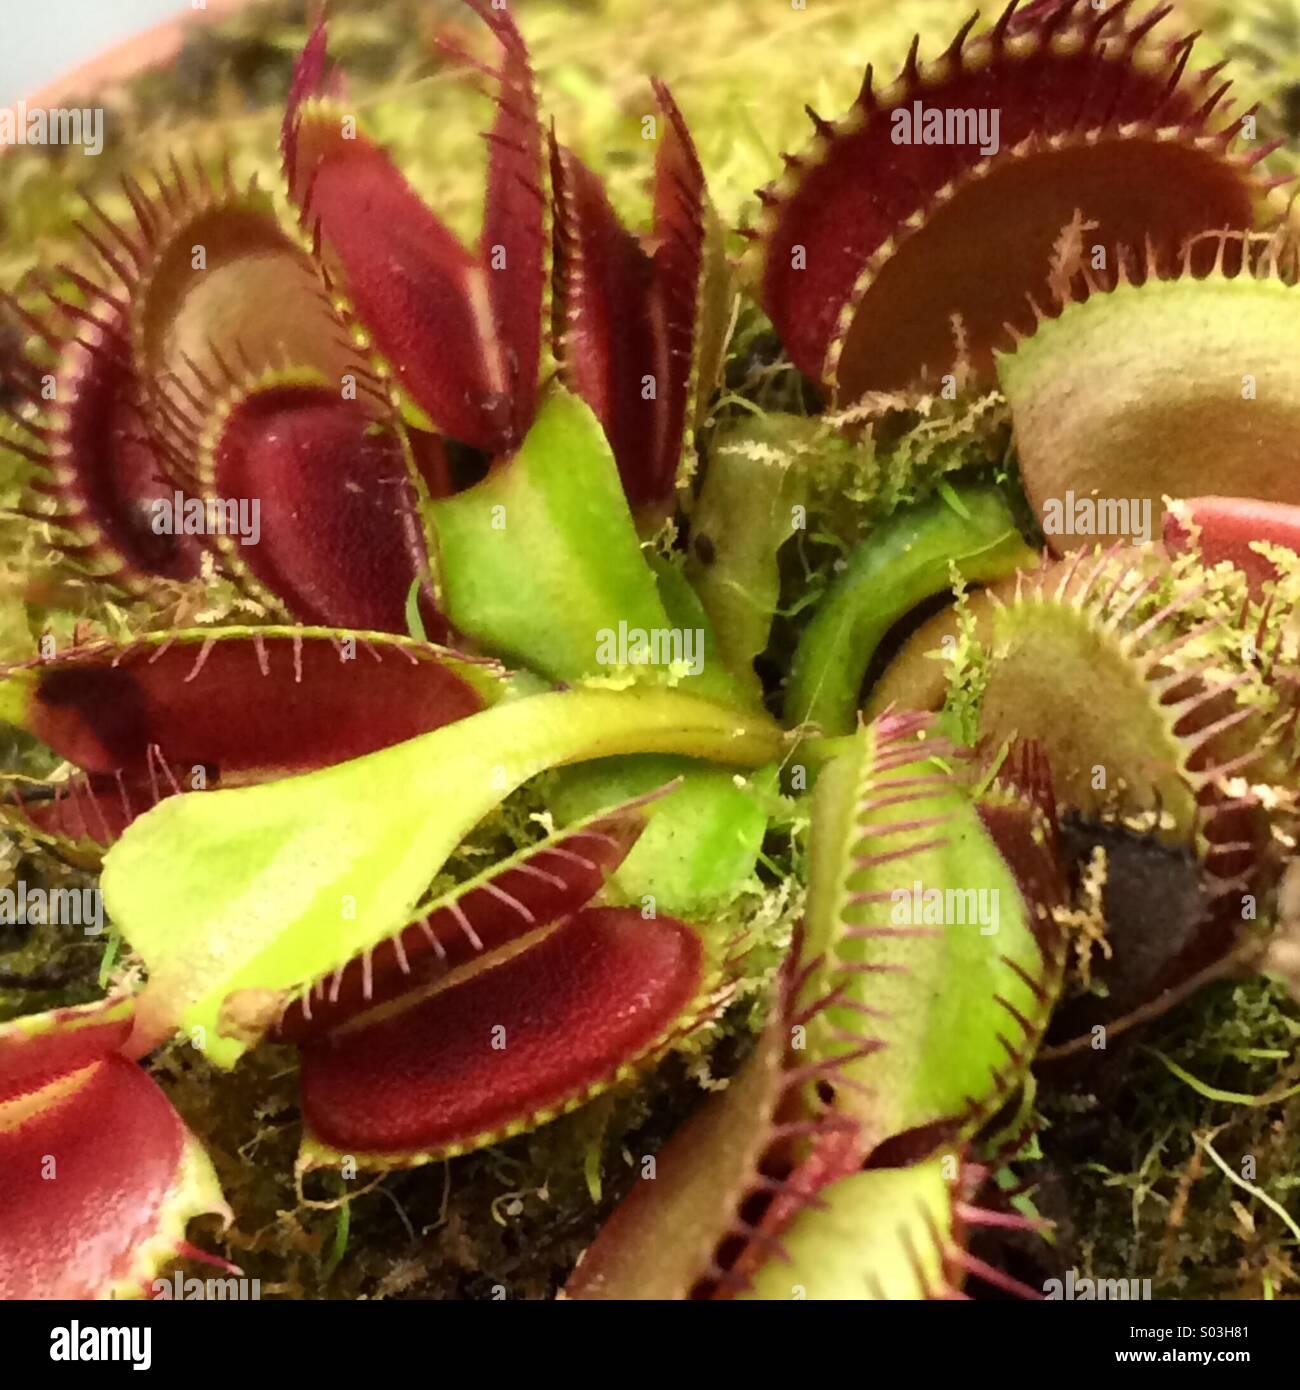 venus fliegenfalle pflanze stockfoto bild 309866033 alamy. Black Bedroom Furniture Sets. Home Design Ideas